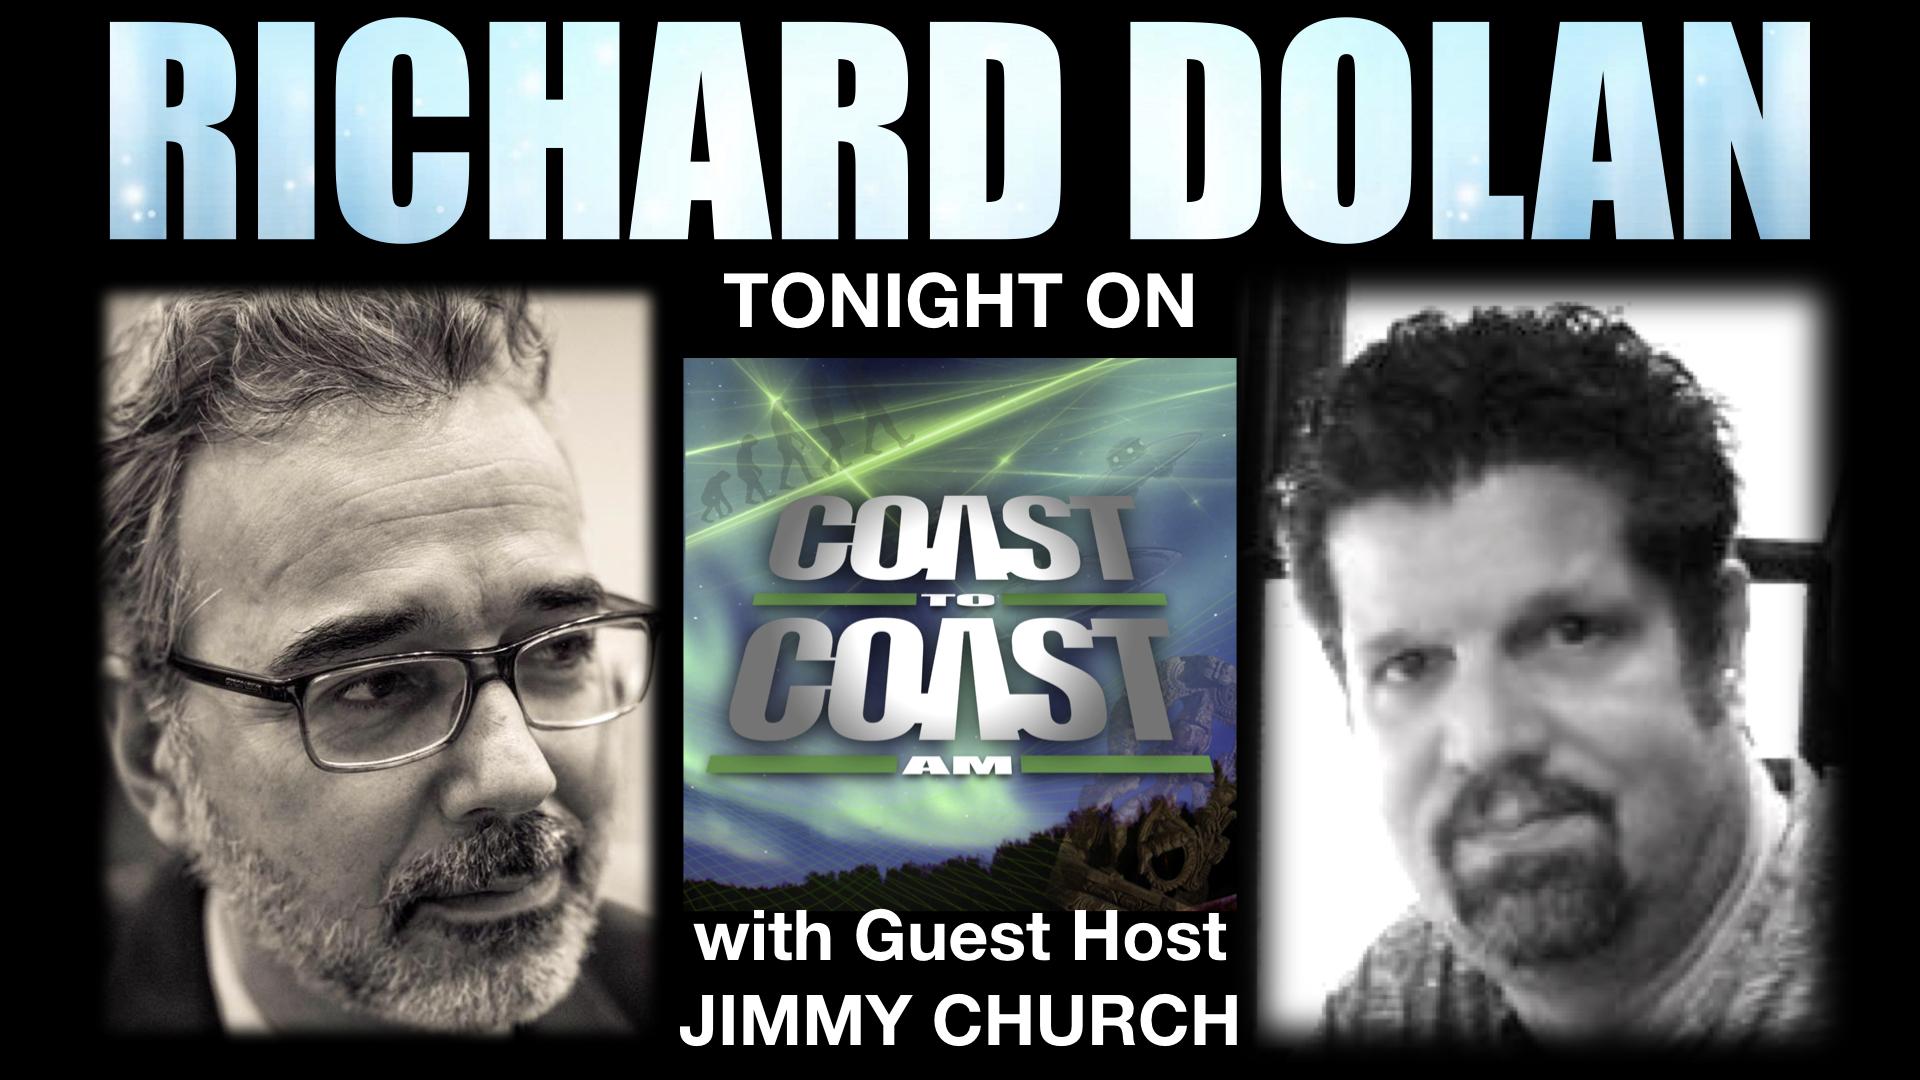 Richard on Coast to Coast AM Tonight - Richard Dolan Members